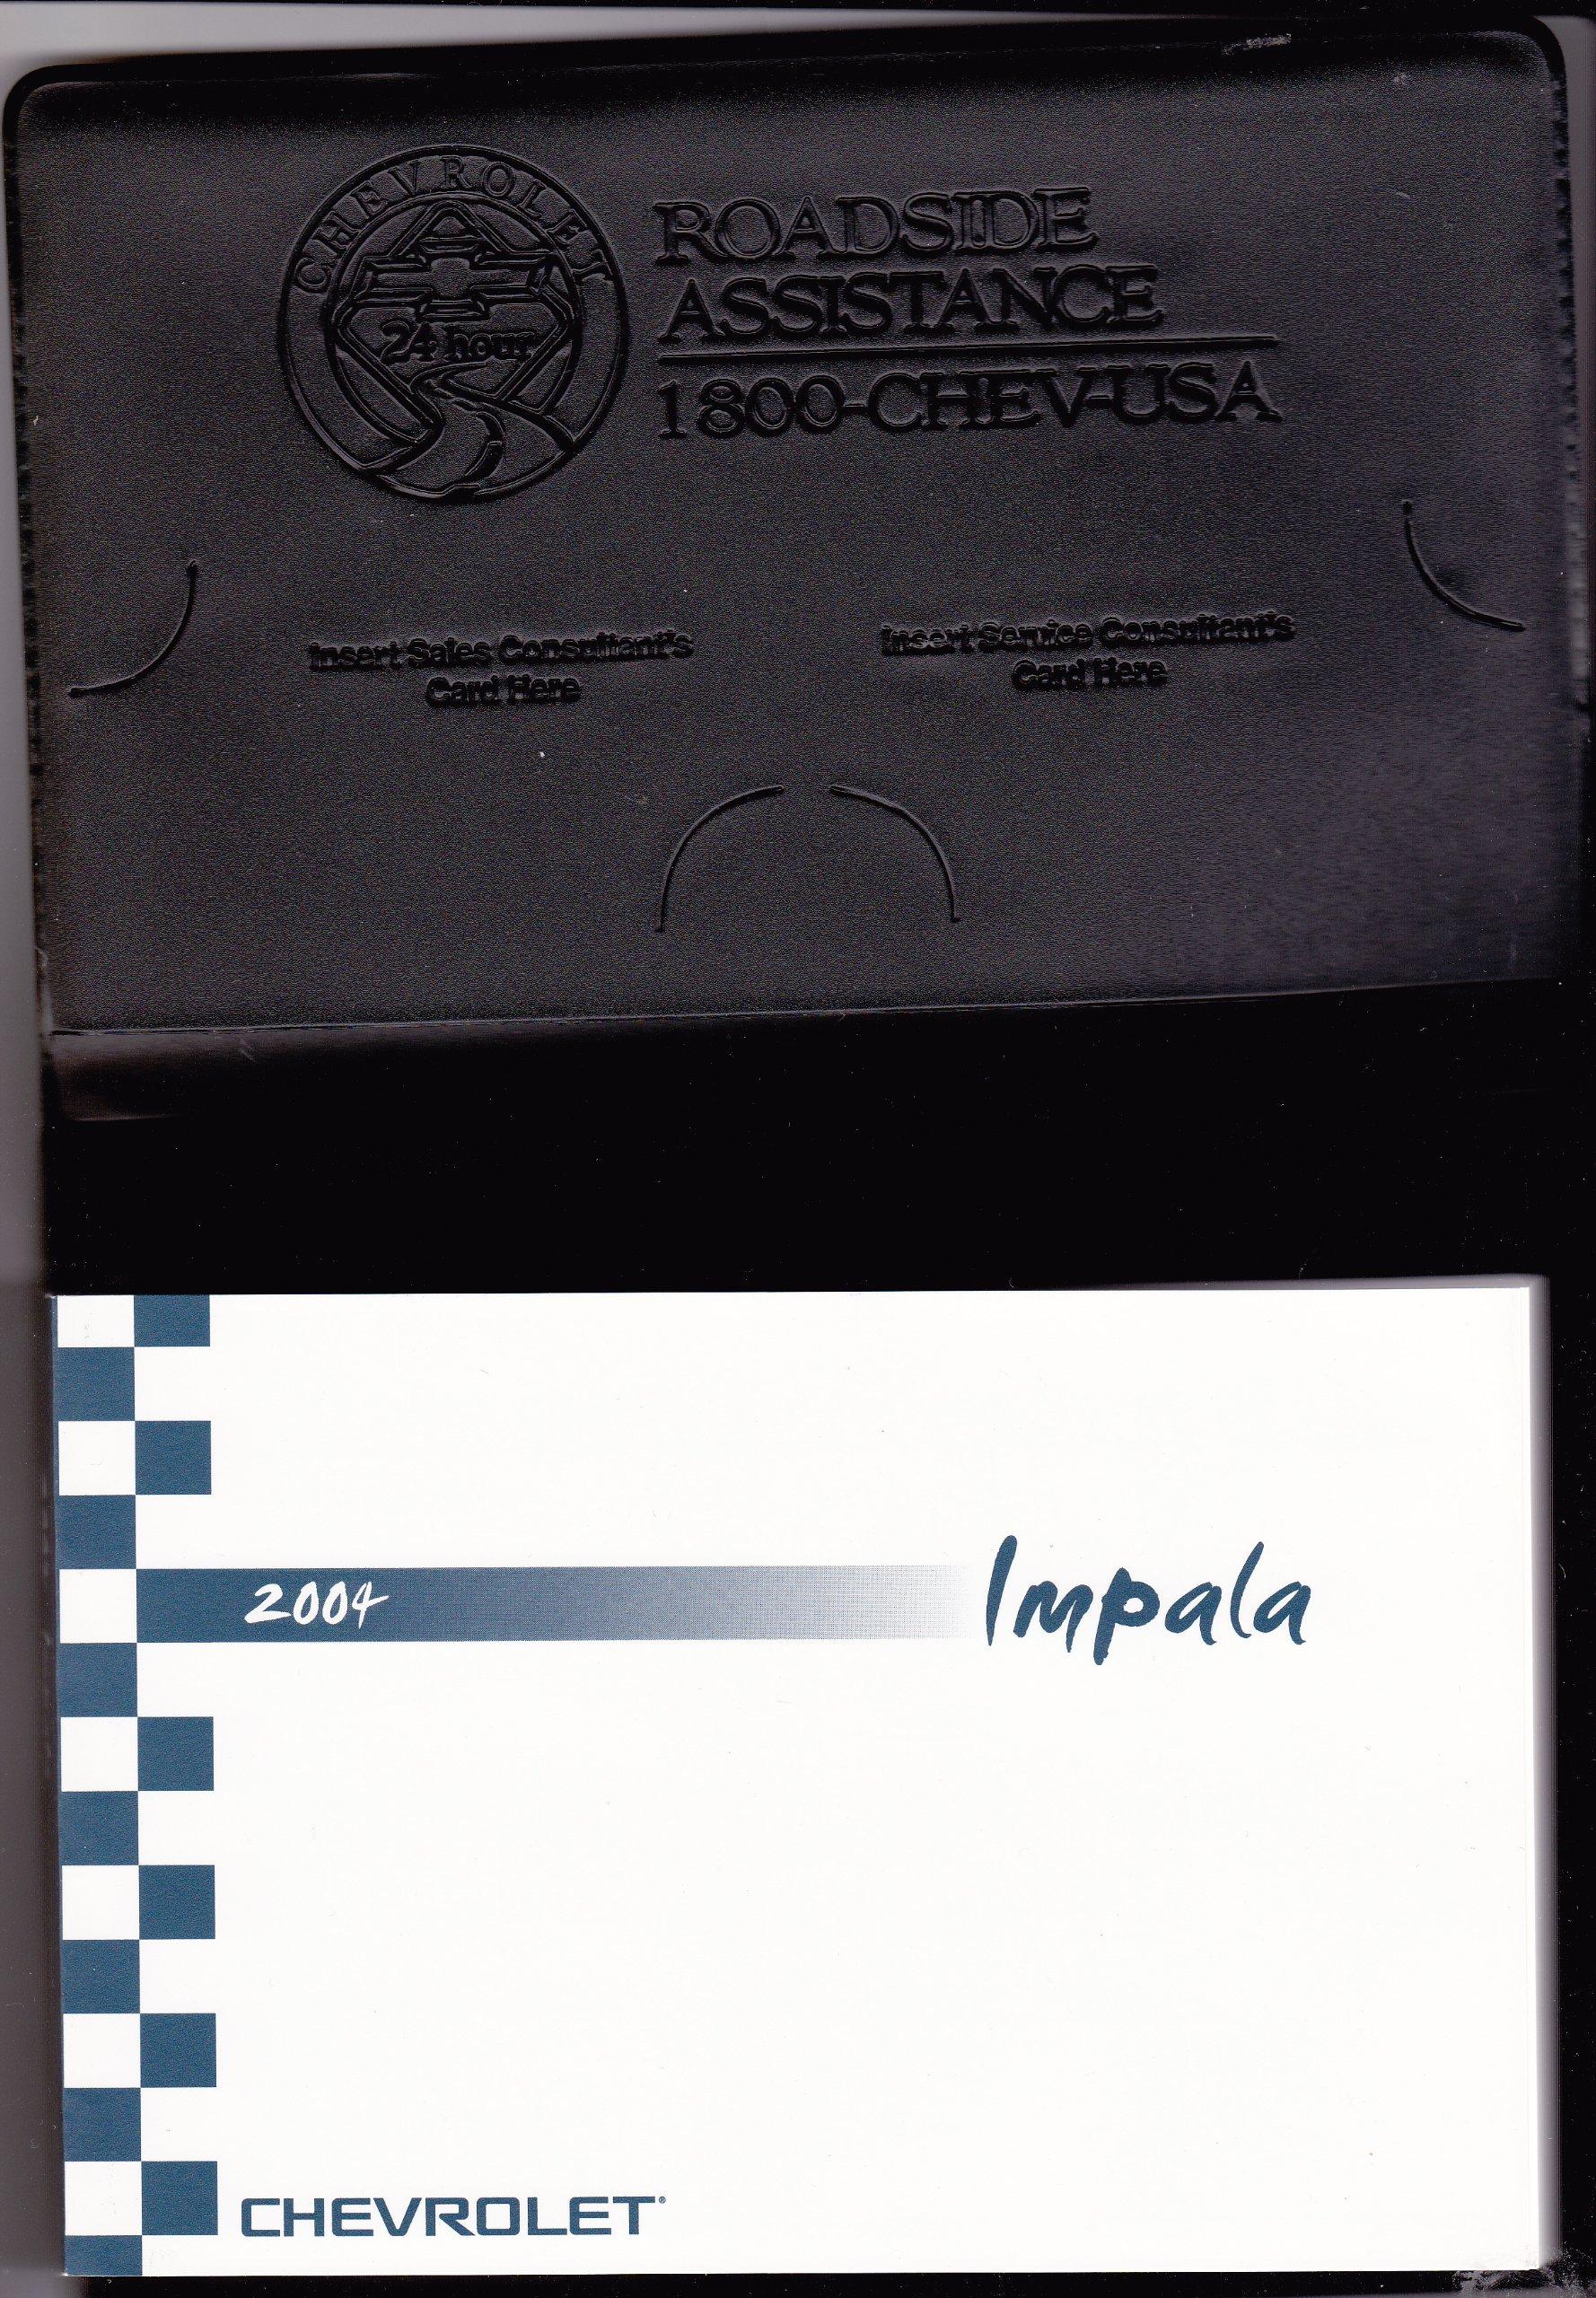 2004 chevrolet impala owners manual chevrolet amazon com books rh amazon com 04 Chevy Impala Interior 04 Chevy Impala Interior